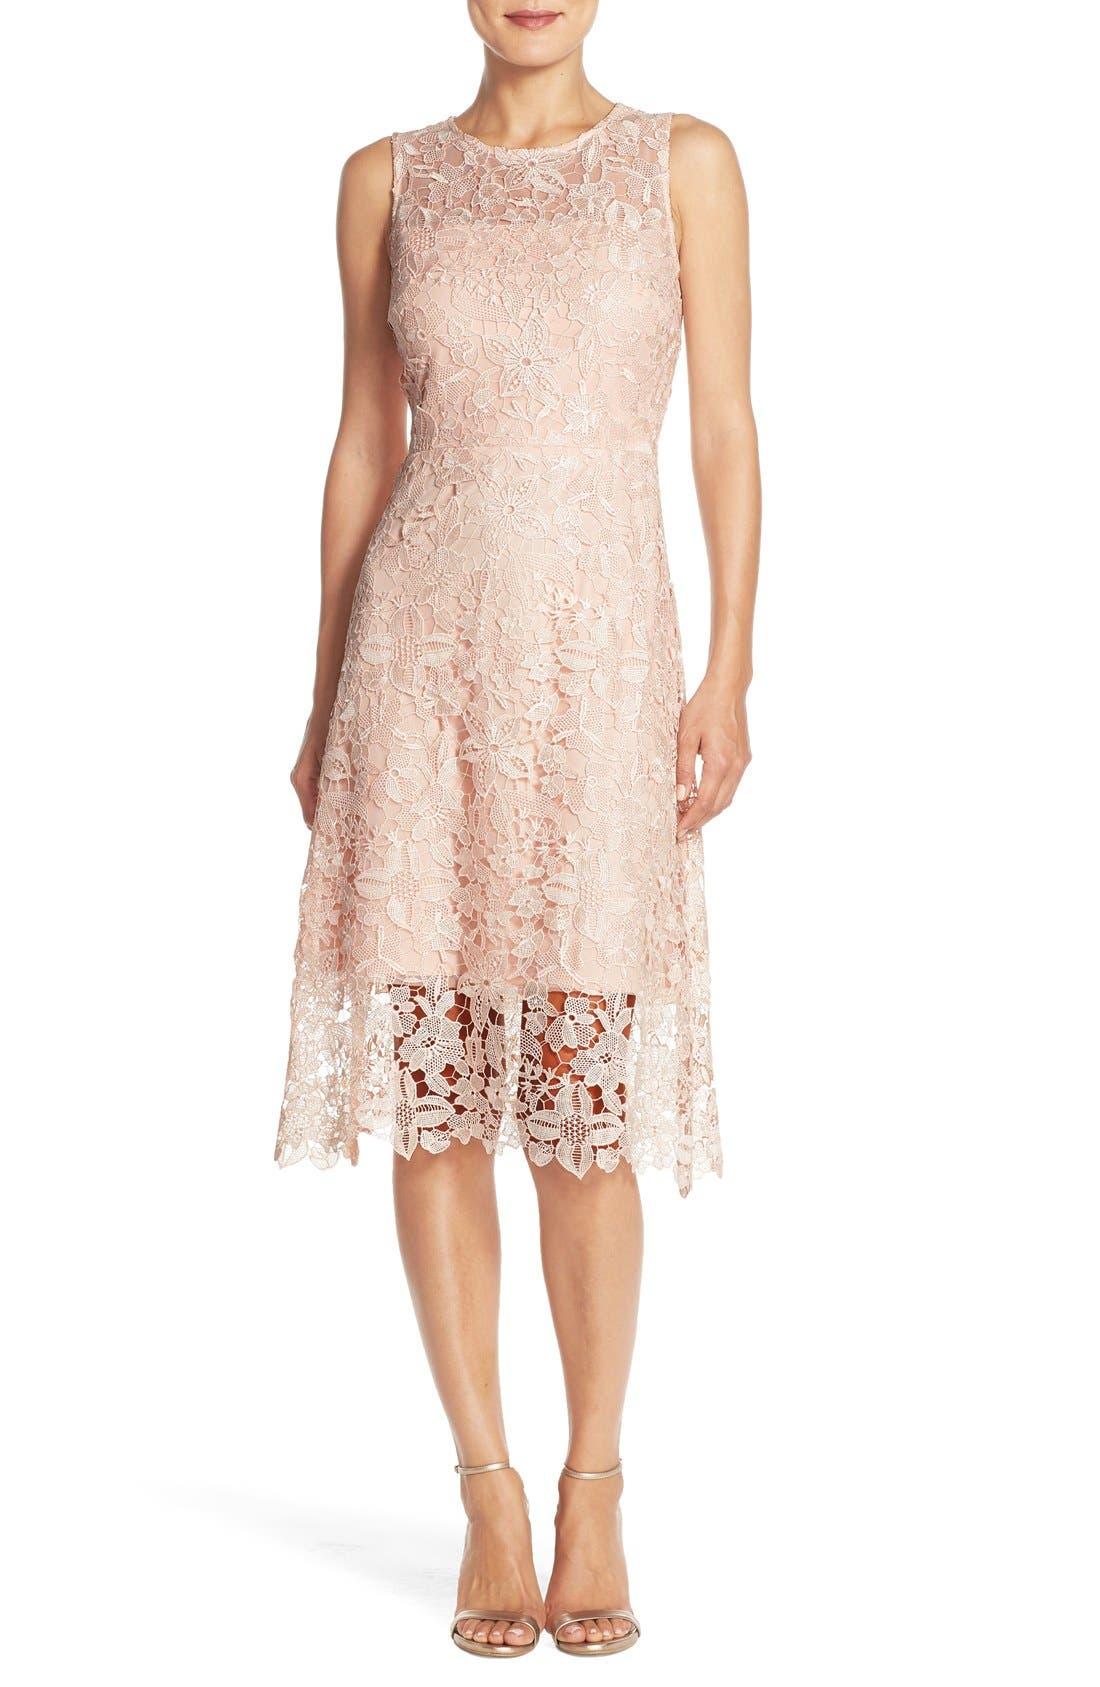 Alternate Image 1 Selected - Julia Jordan Floral Lace A-Line Dress